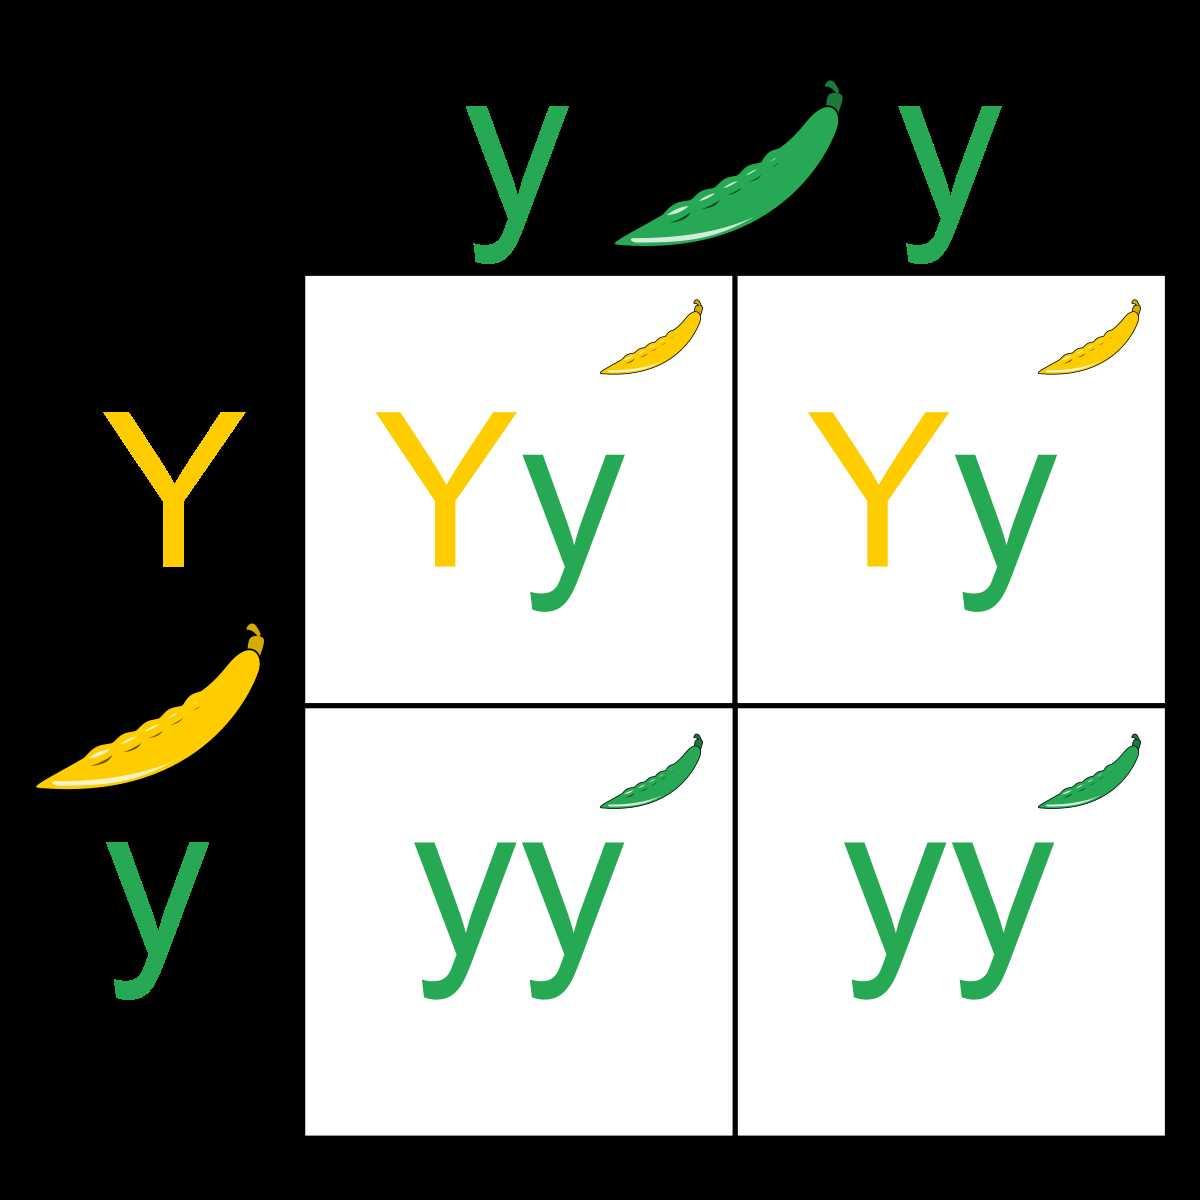 Scientific Method Worksheet 5th Grade With Punnett Square